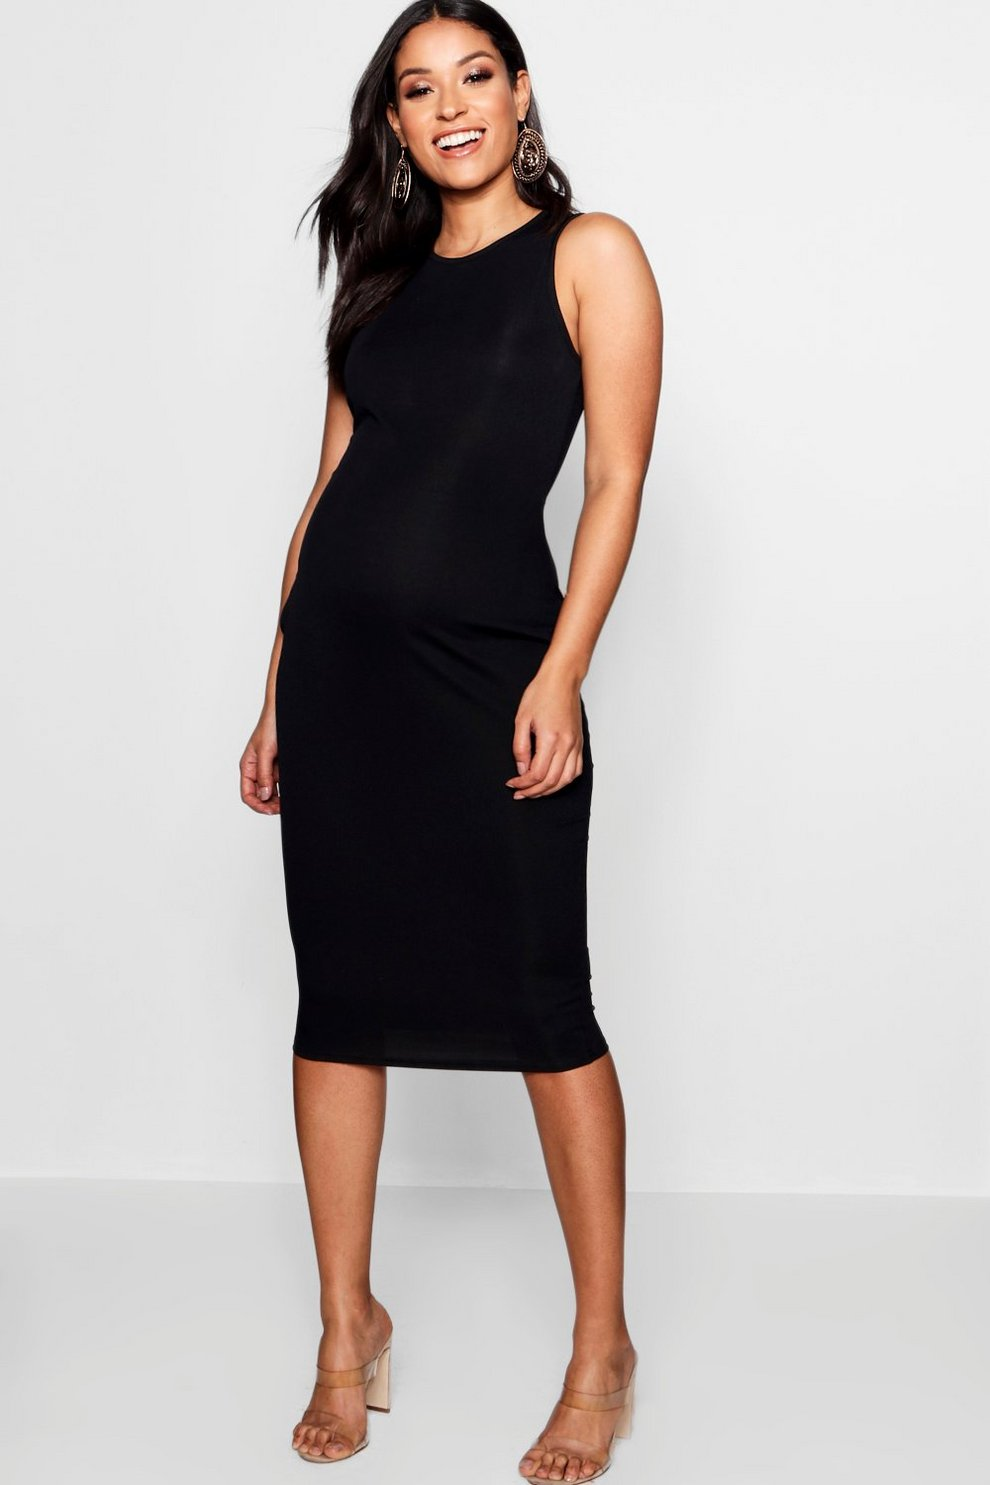 245b4b47193f7 Womens Black Maternity High Neck Ribbed Midi Dress